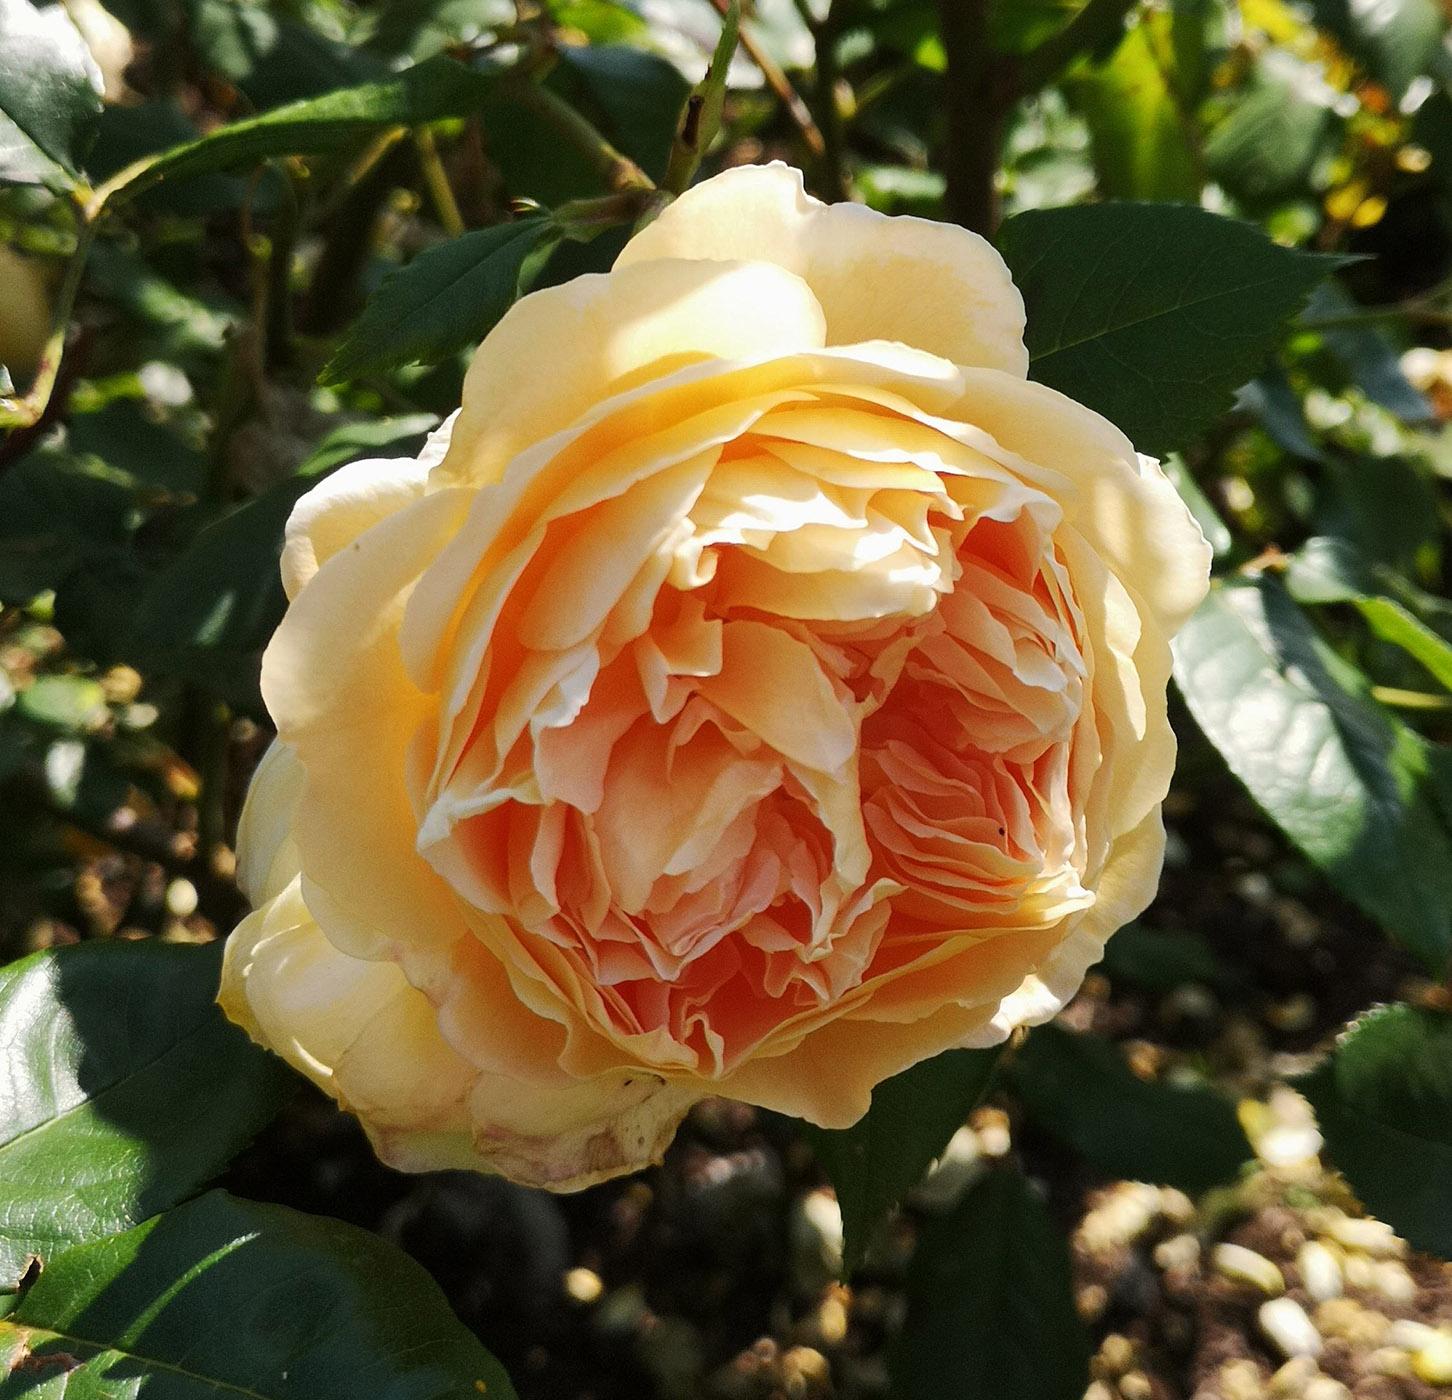 Abbotsford gardens peachy yellow rose.jpg